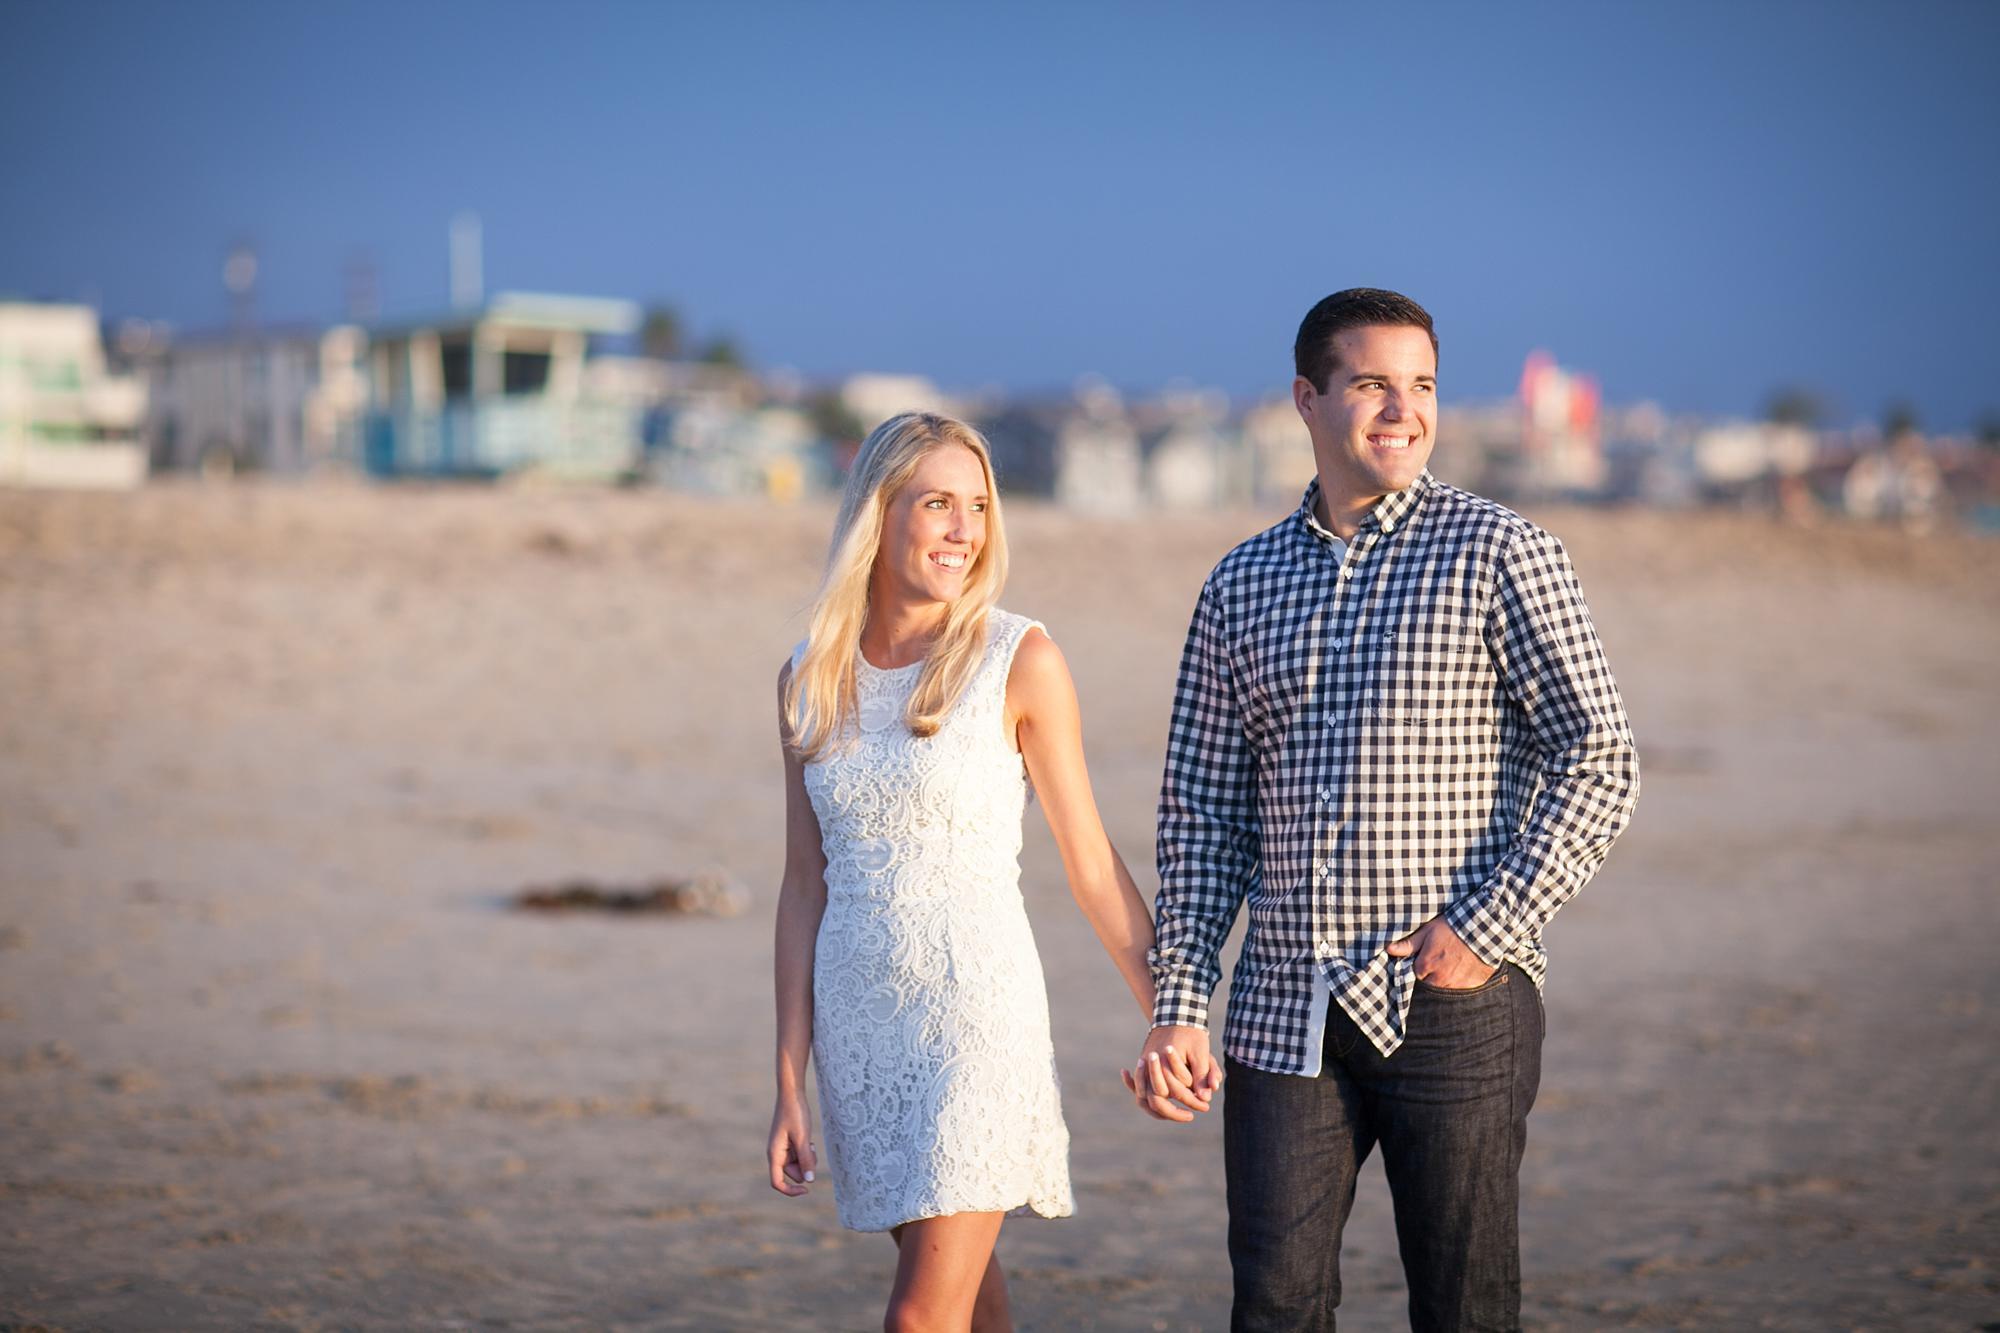 Hermosa Beach Engagement   Miki & Sonja Photography   mikiandsonja.com